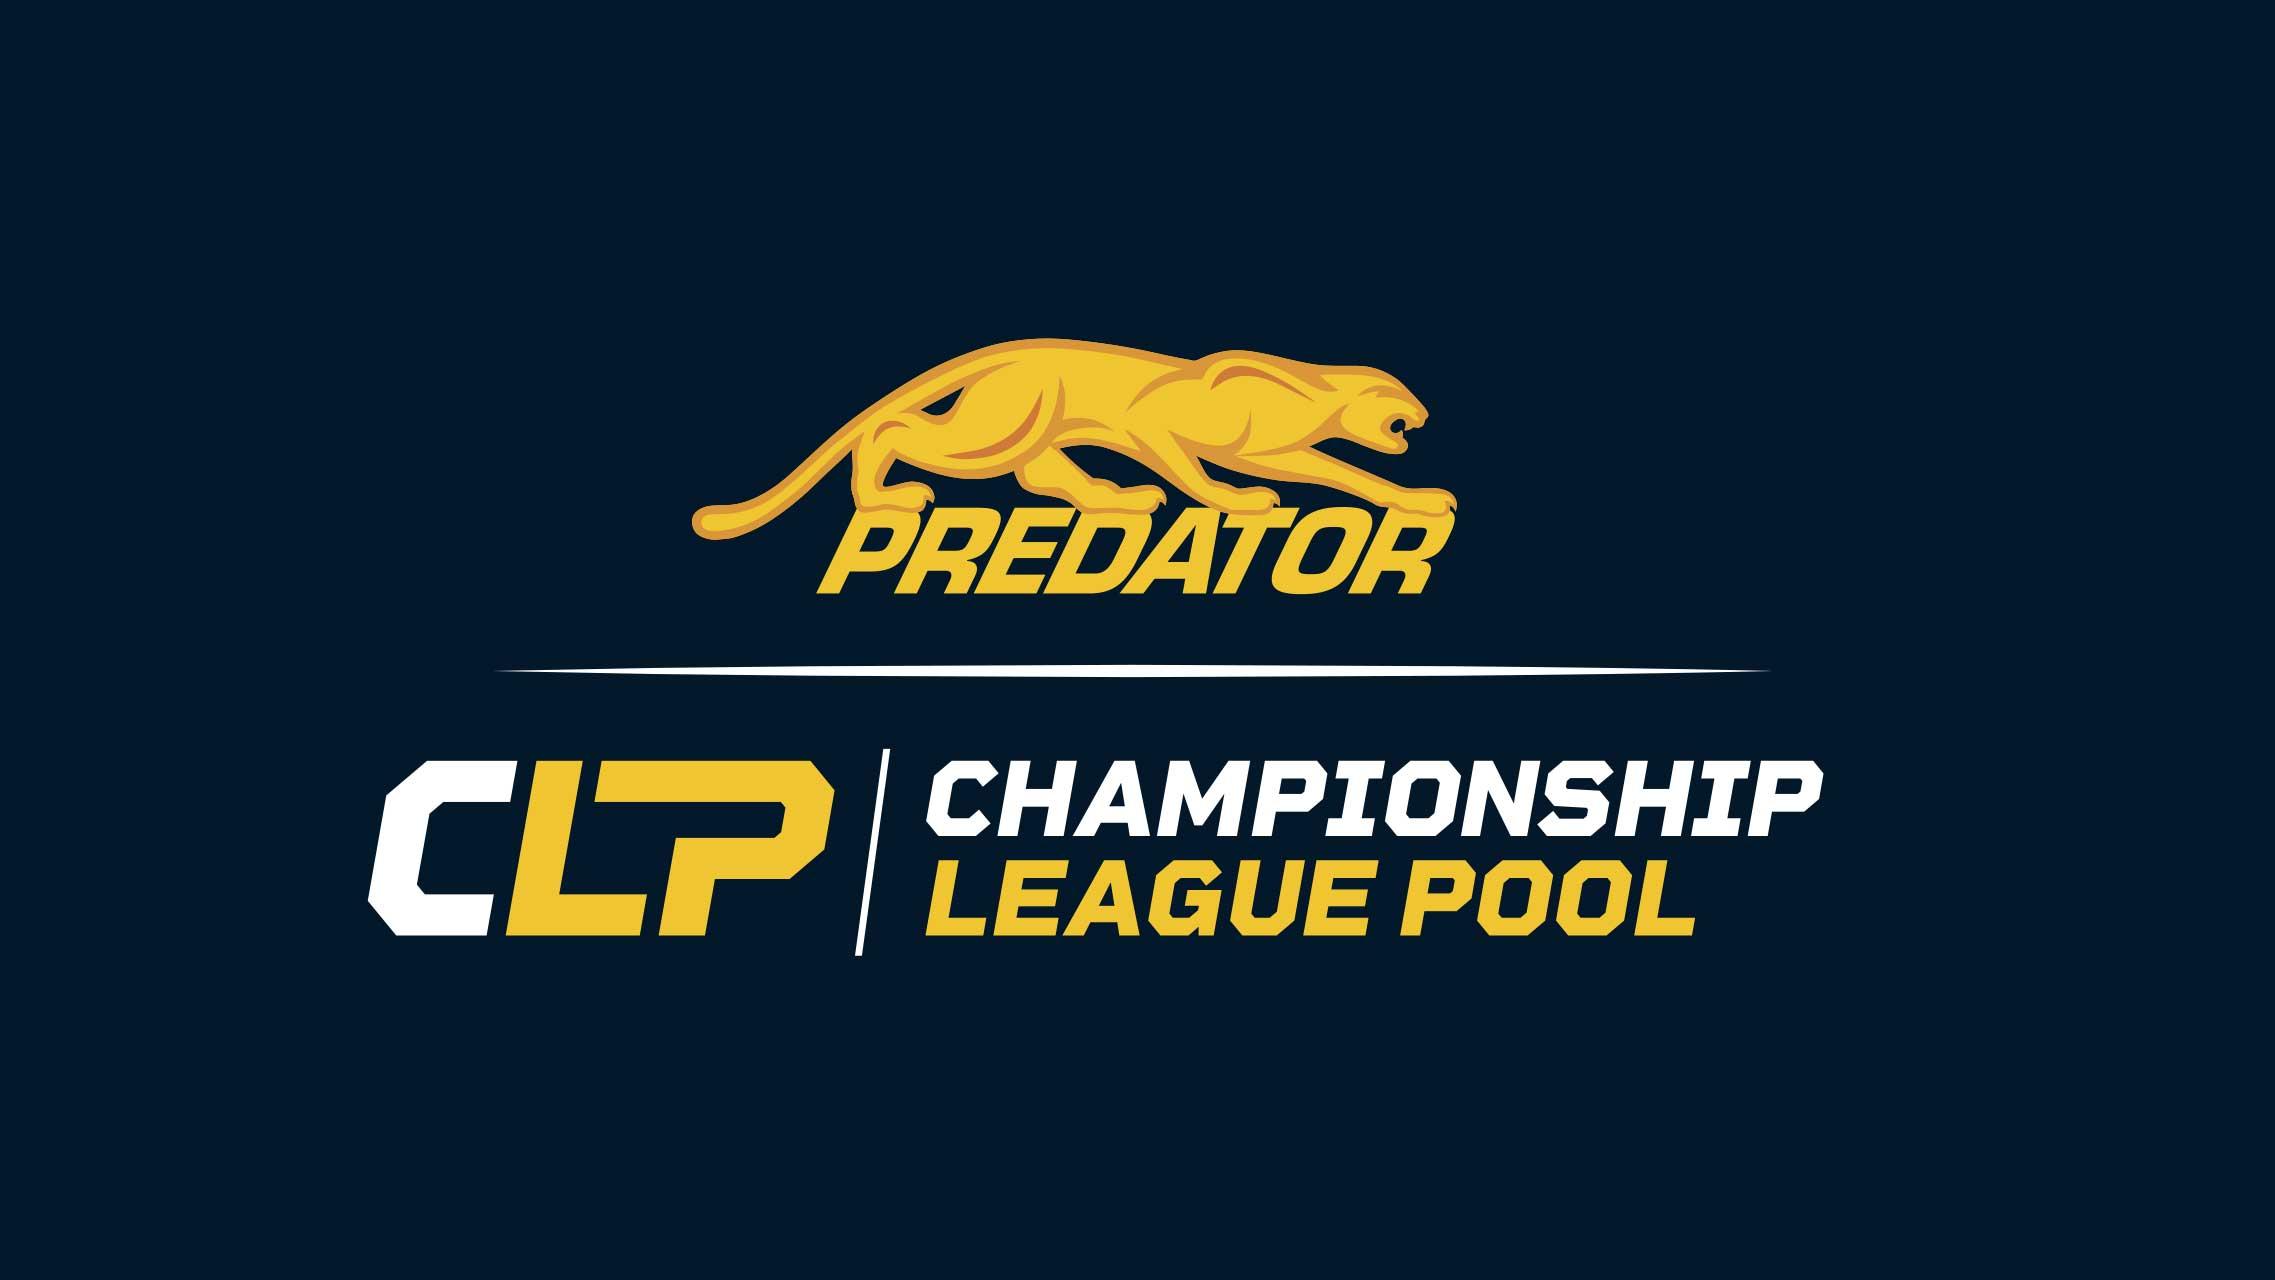 Matchroom Pool - Championship League Pool